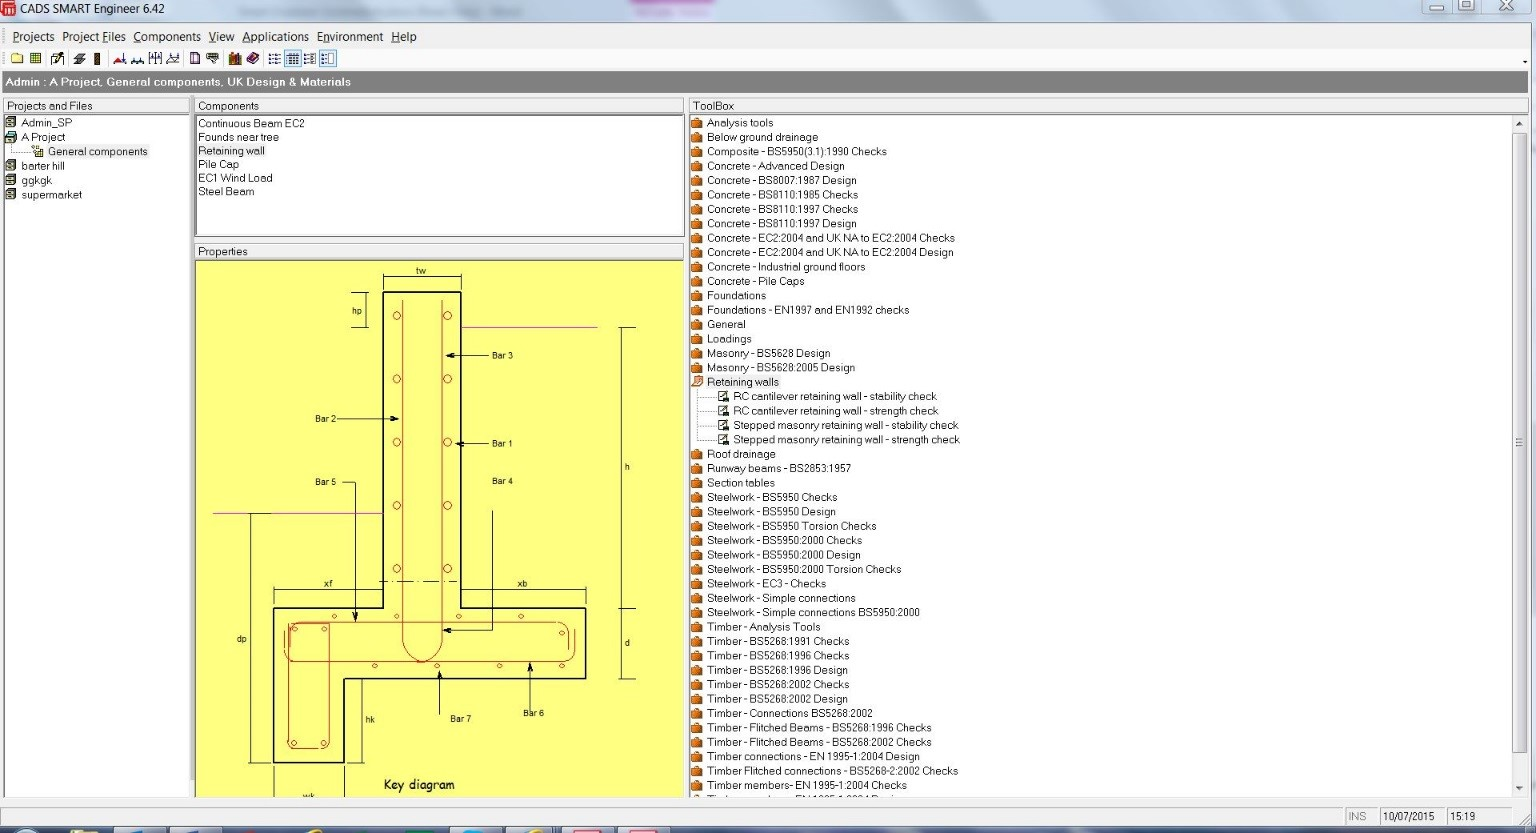 SMART Engineer - 100\'s of calculation templates - CADS UK